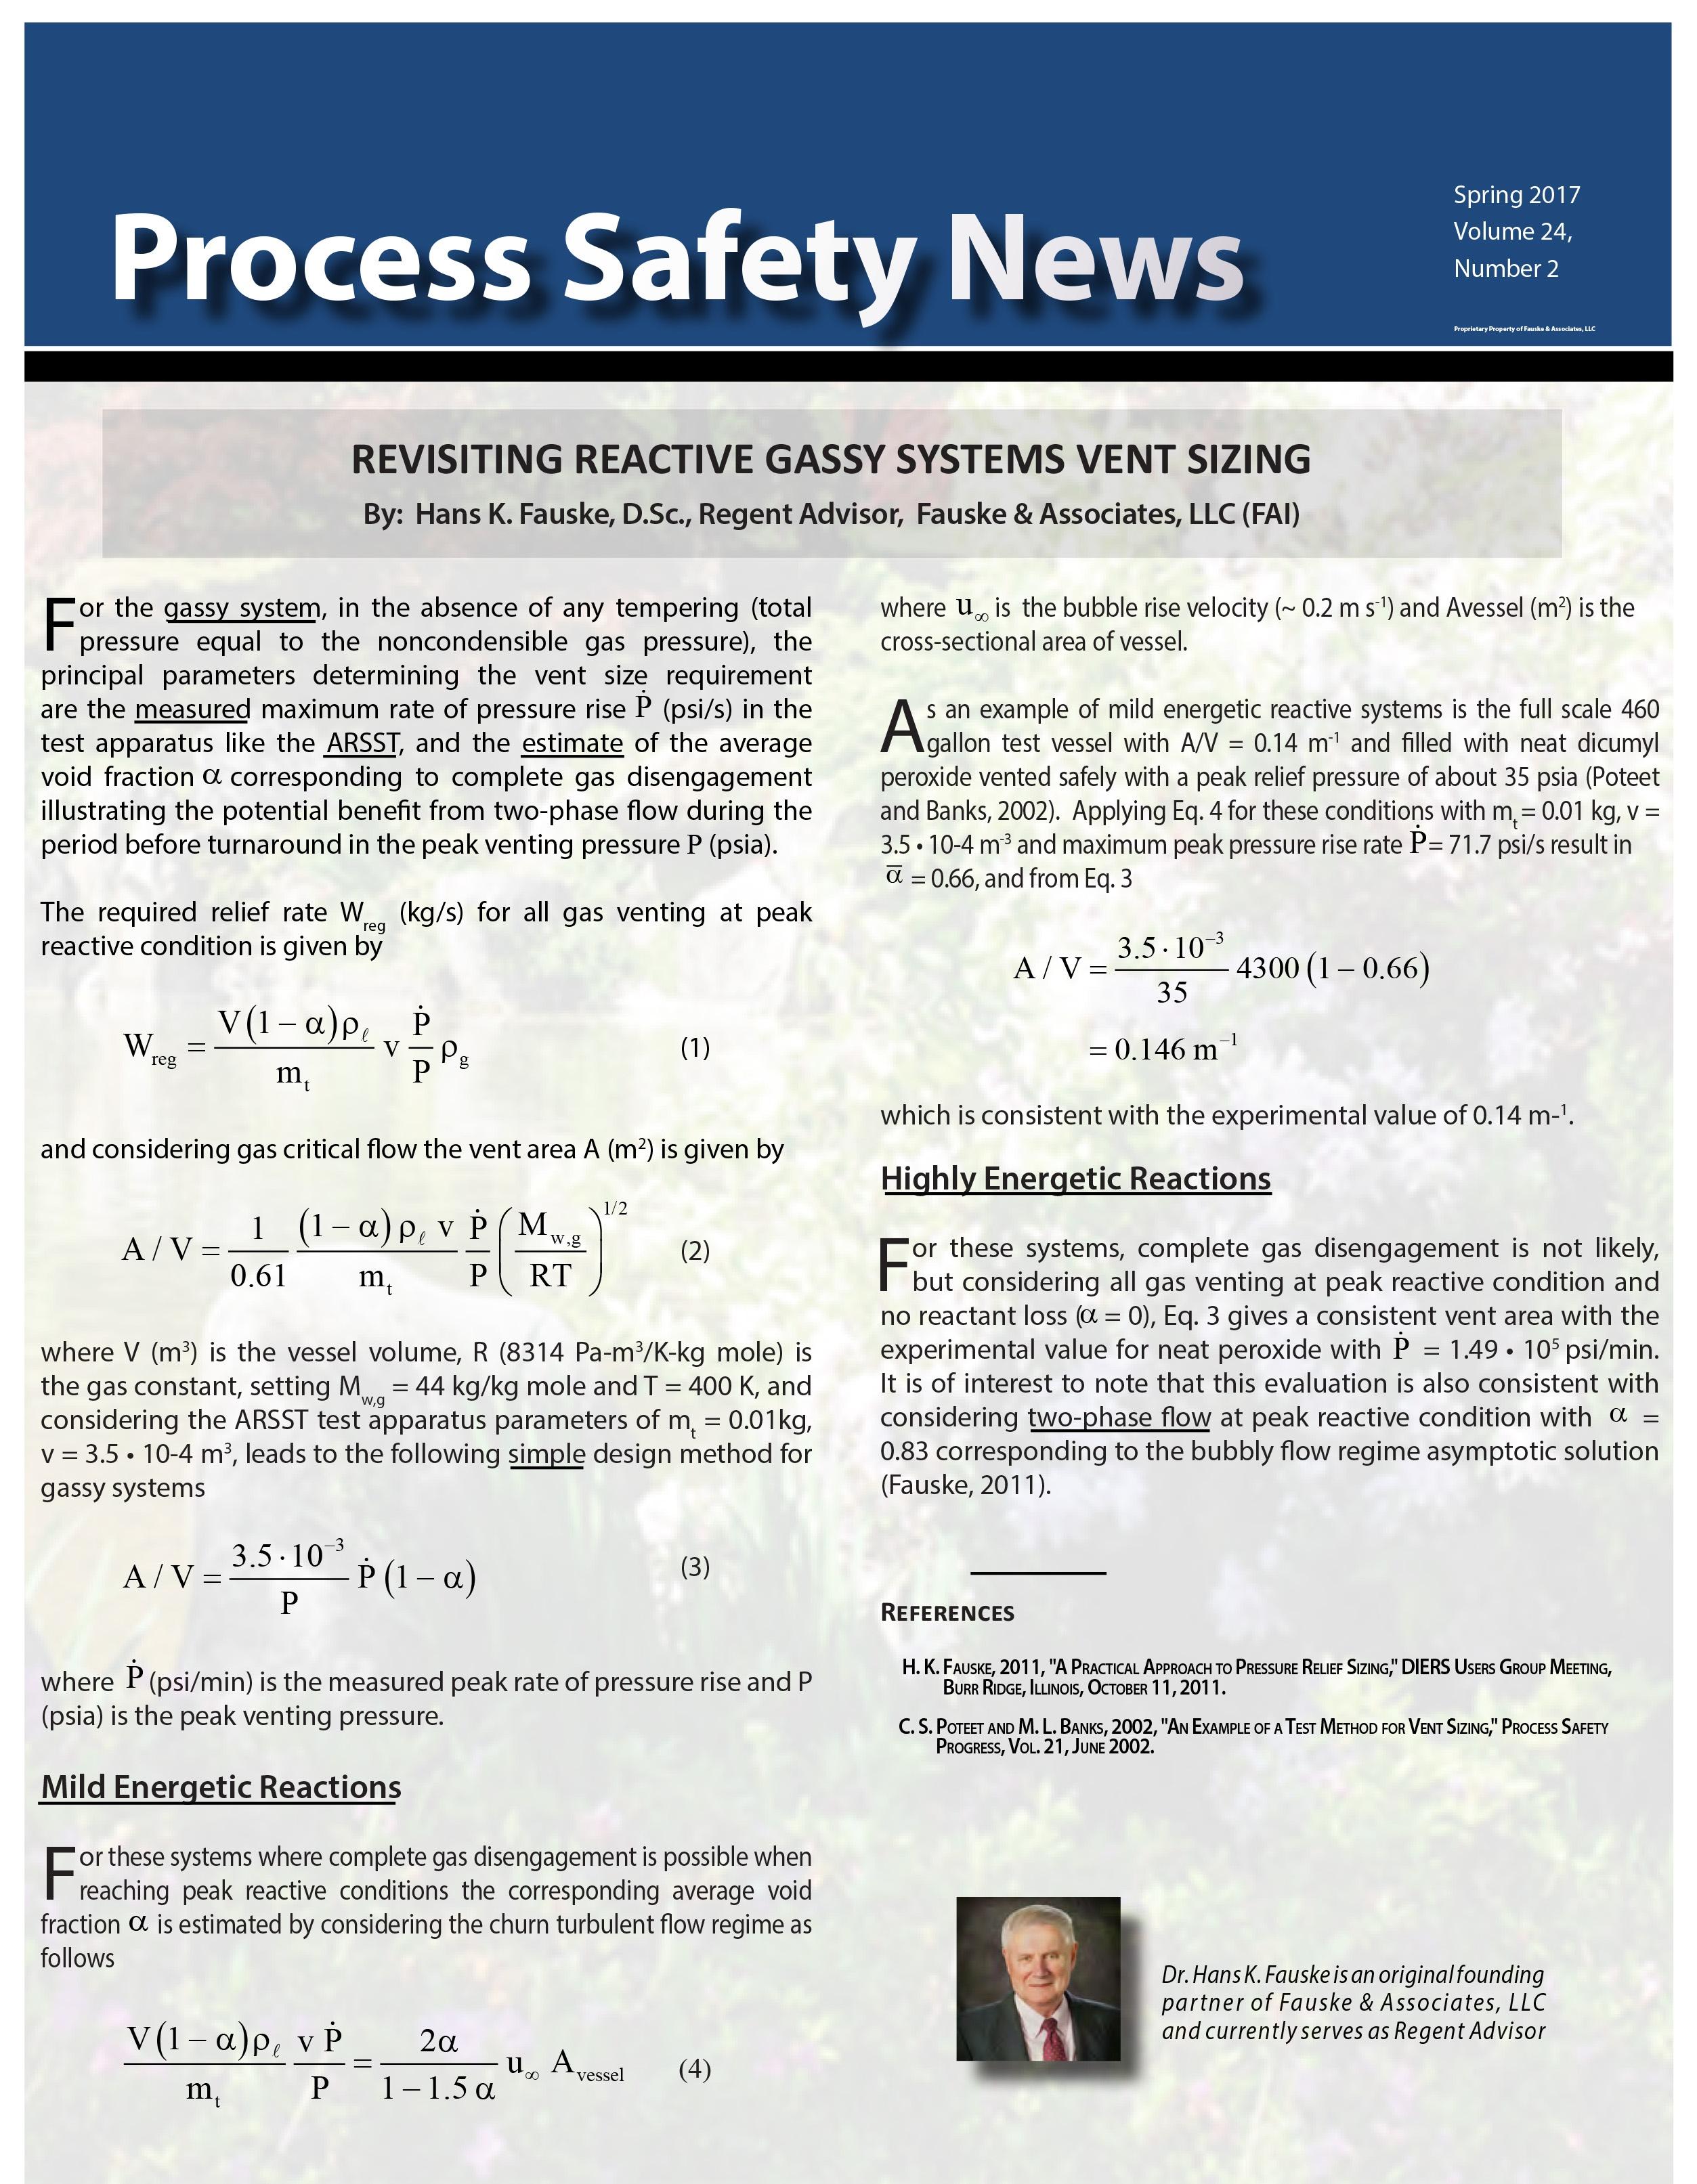 Process Safety Newsletter  Spring 2017-1.jpg